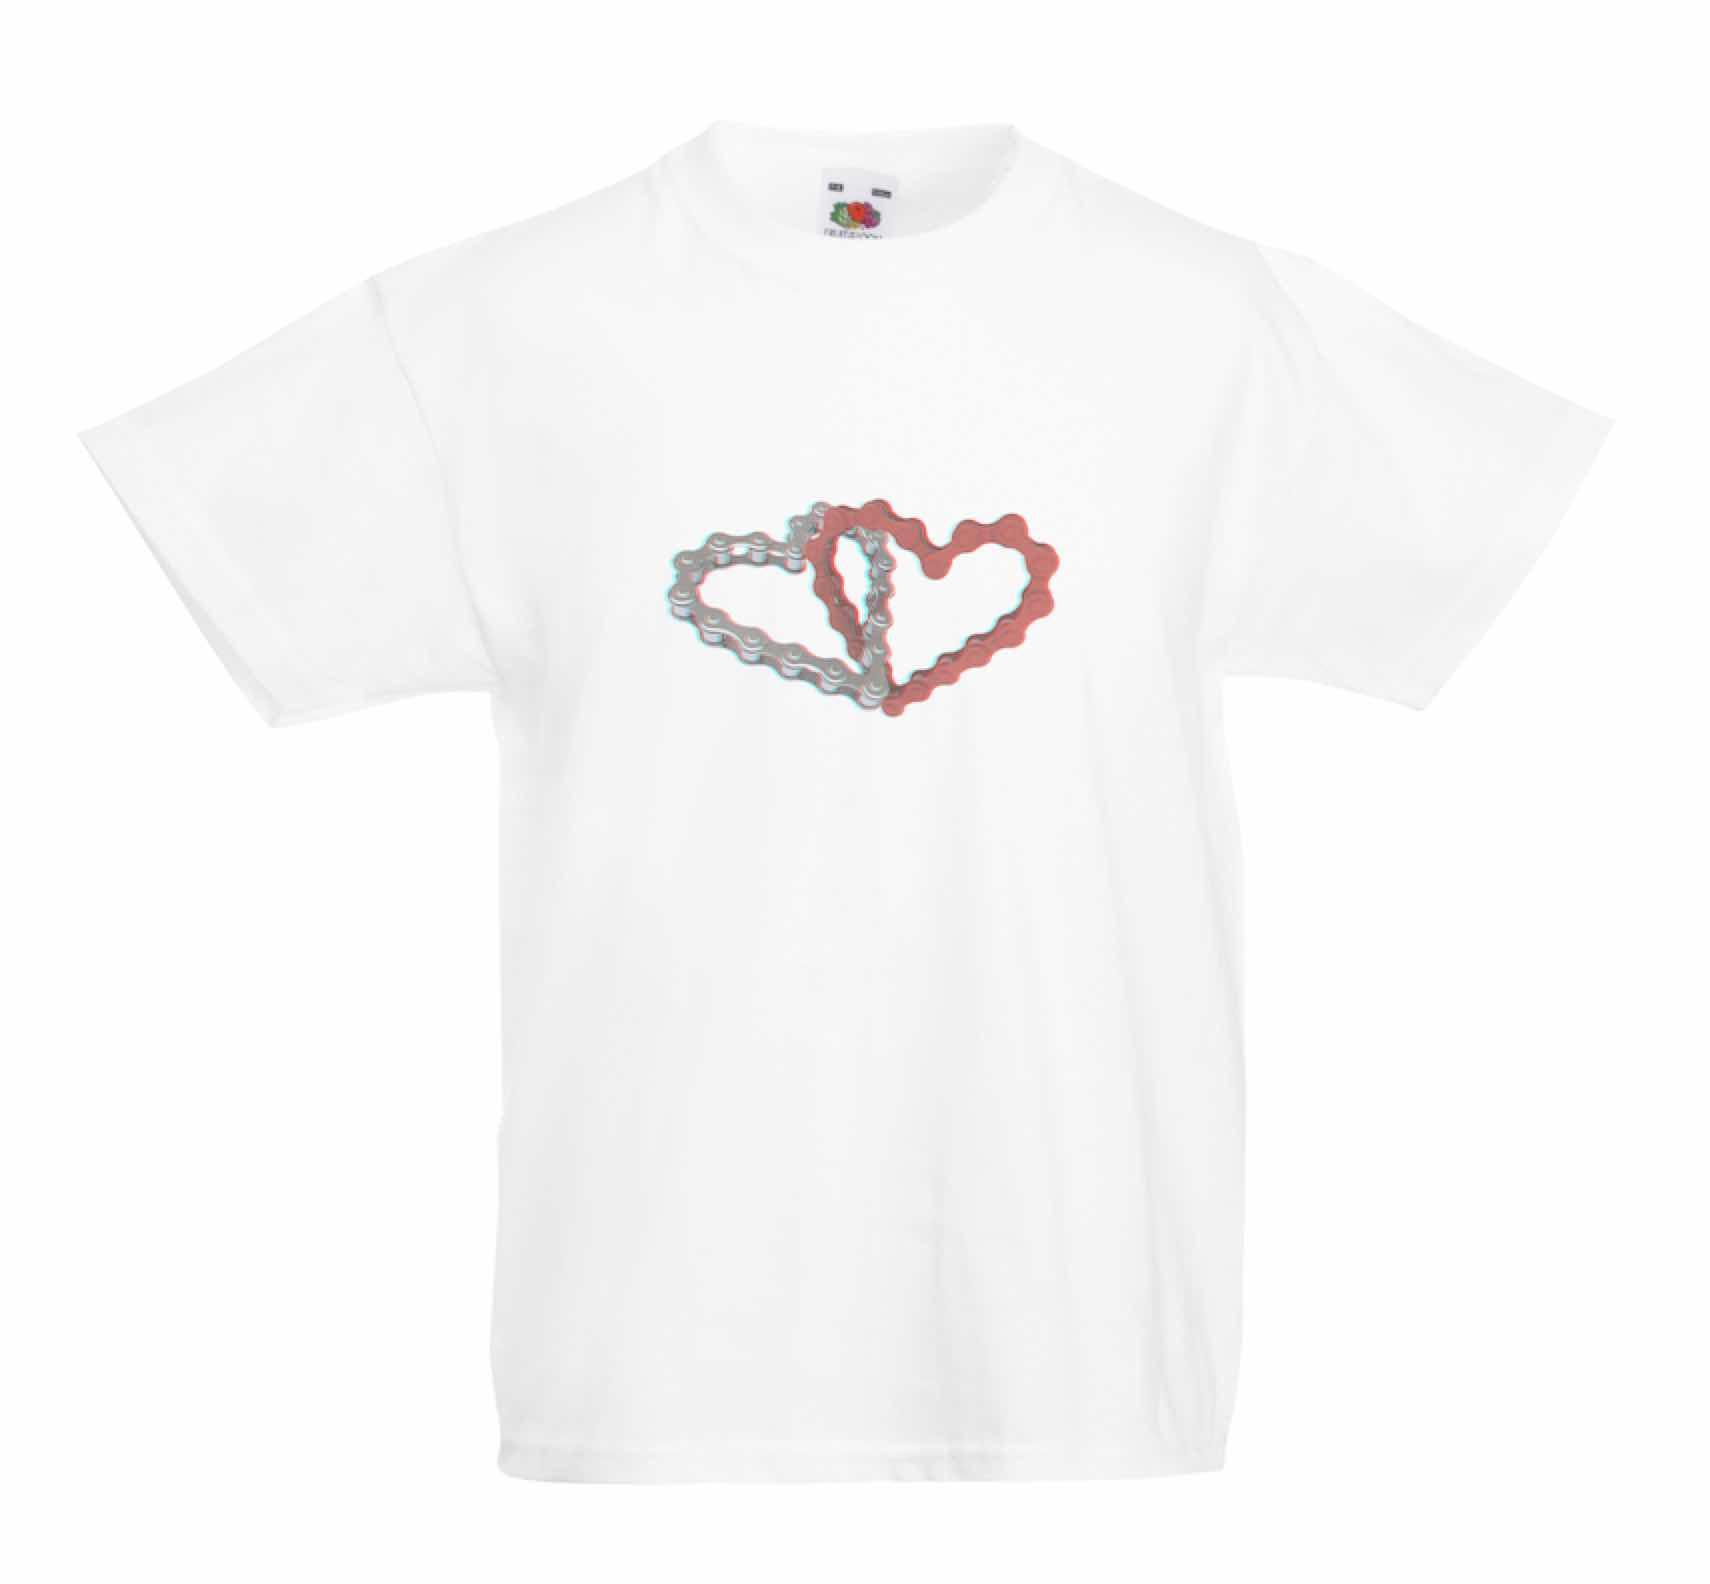 Chain Heart design for t-shirt, hoodie & sweatshirt